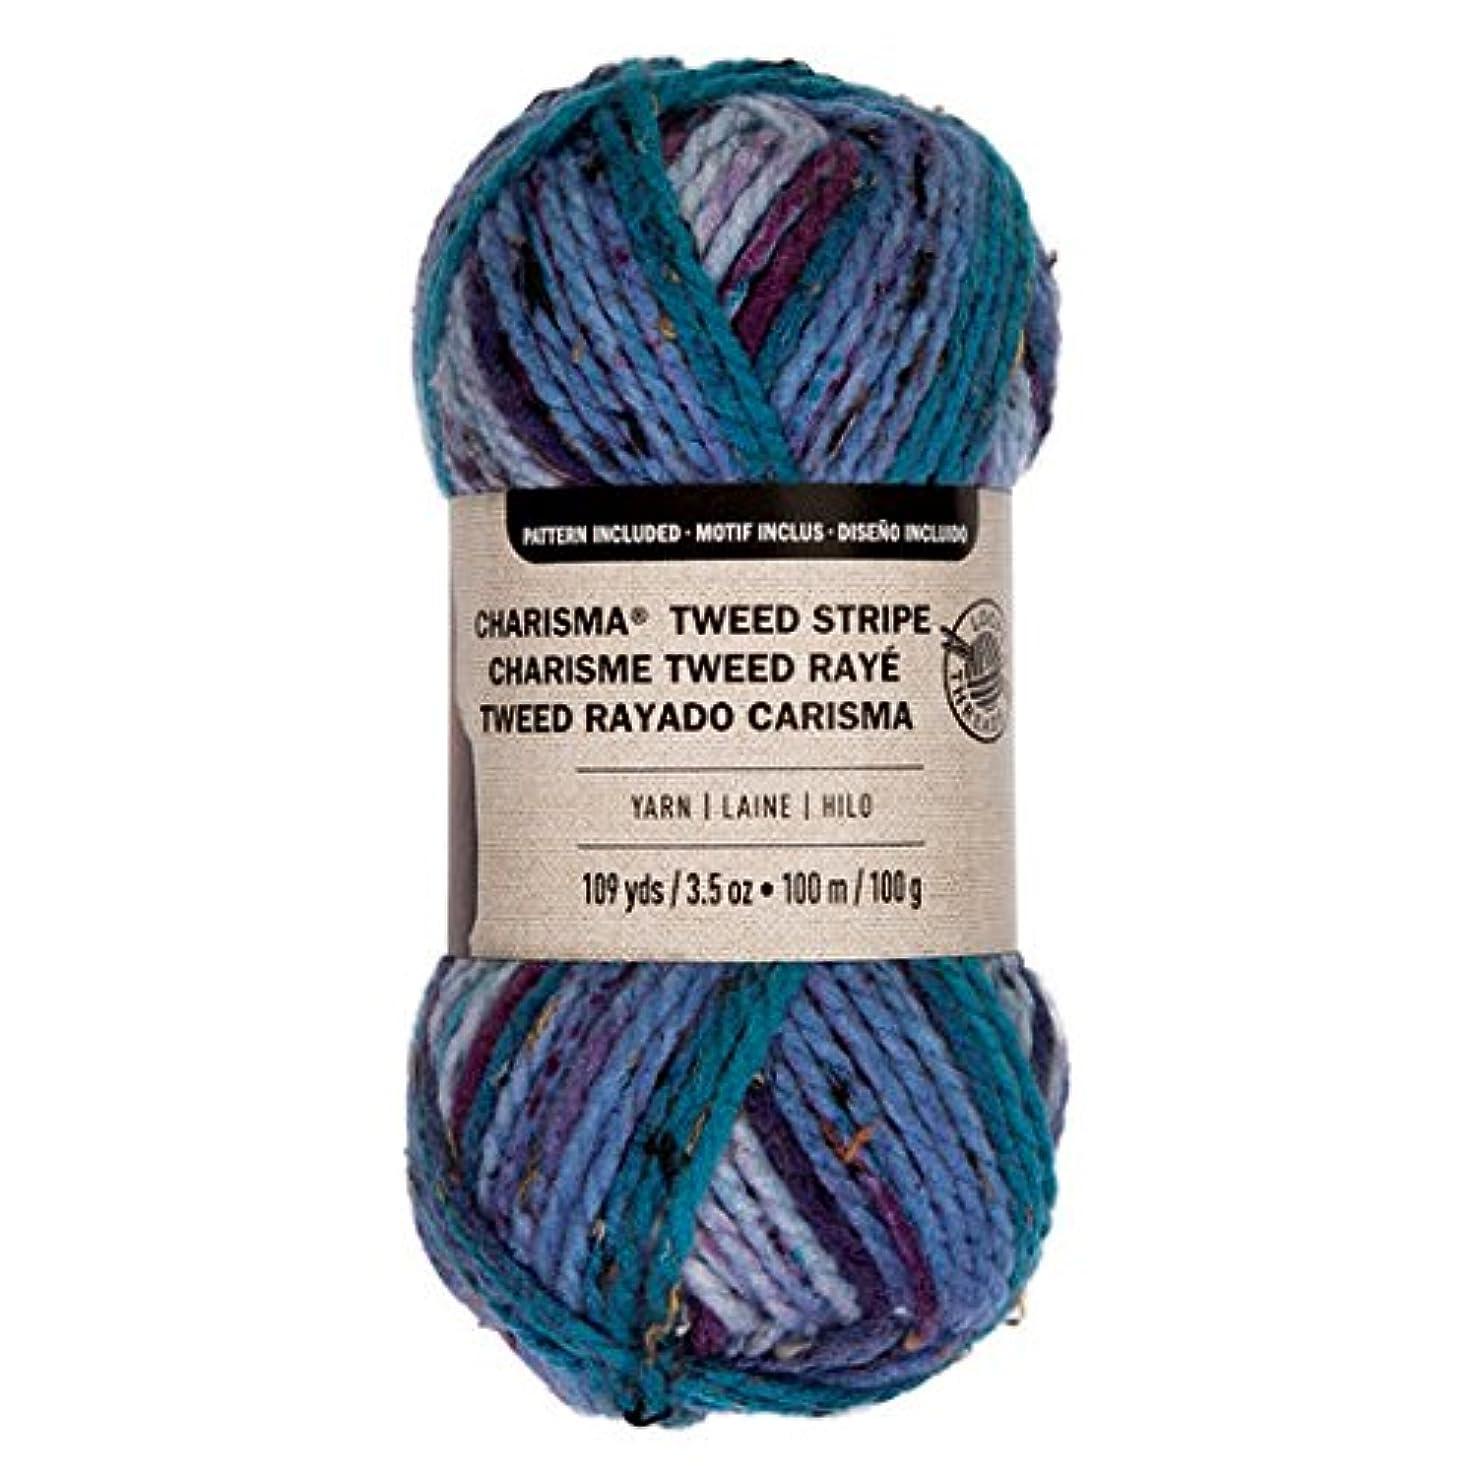 Loops & Threads Charisma Tweed Stripe Yarn 1 Ball 3.5 oz. - Mountain Lake